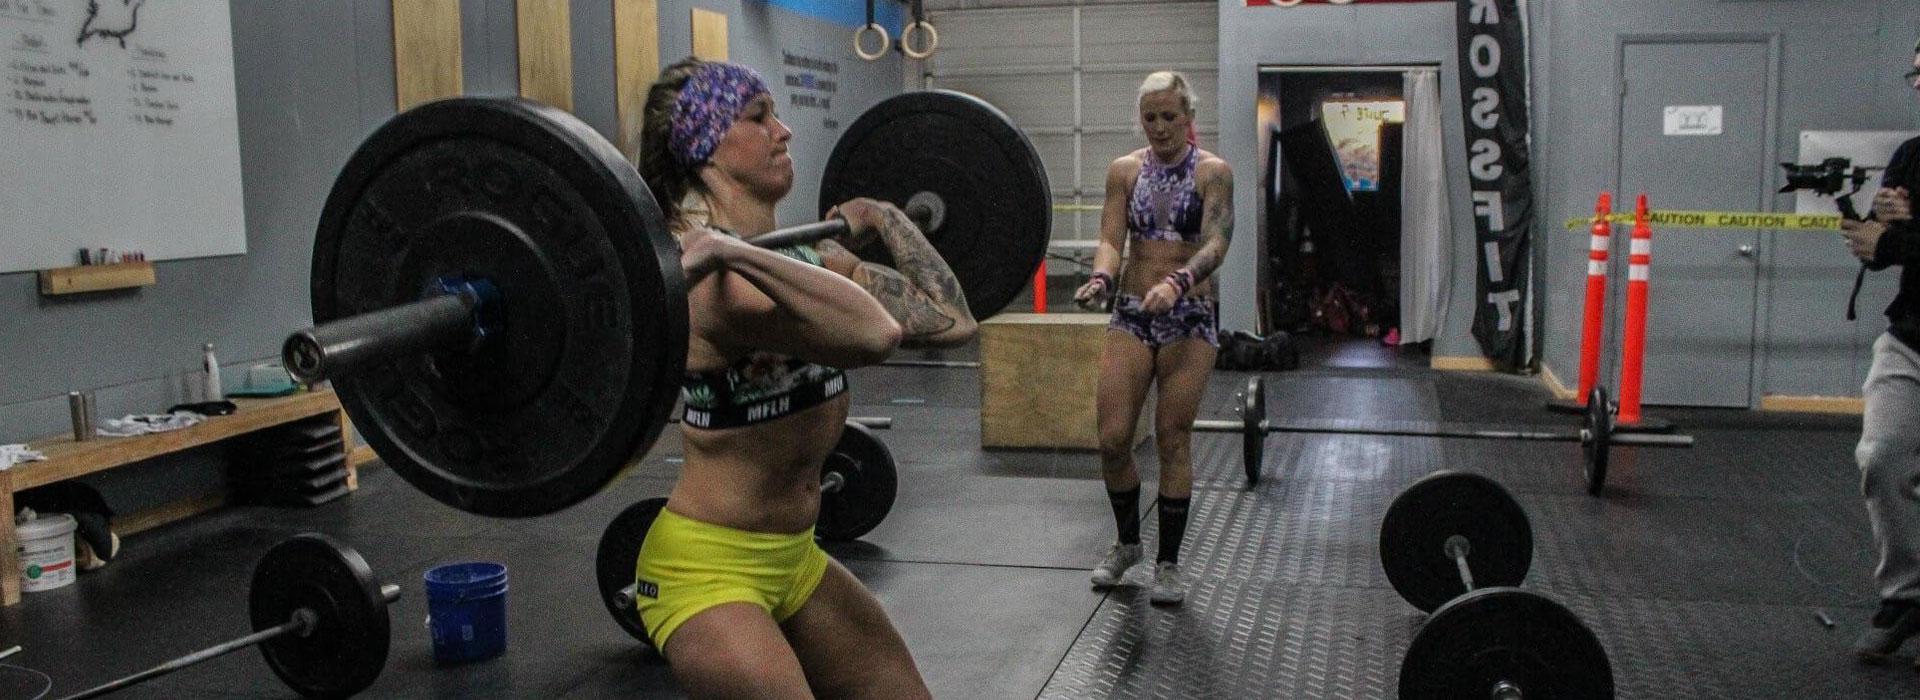 Fitness Gym in Burleson TX, Fitness Gym near South Fort Worth TX, Fitness Gym near Crowley TX, Fitness Gym near Joshua TX, Fitness Gym near Mansfield TX